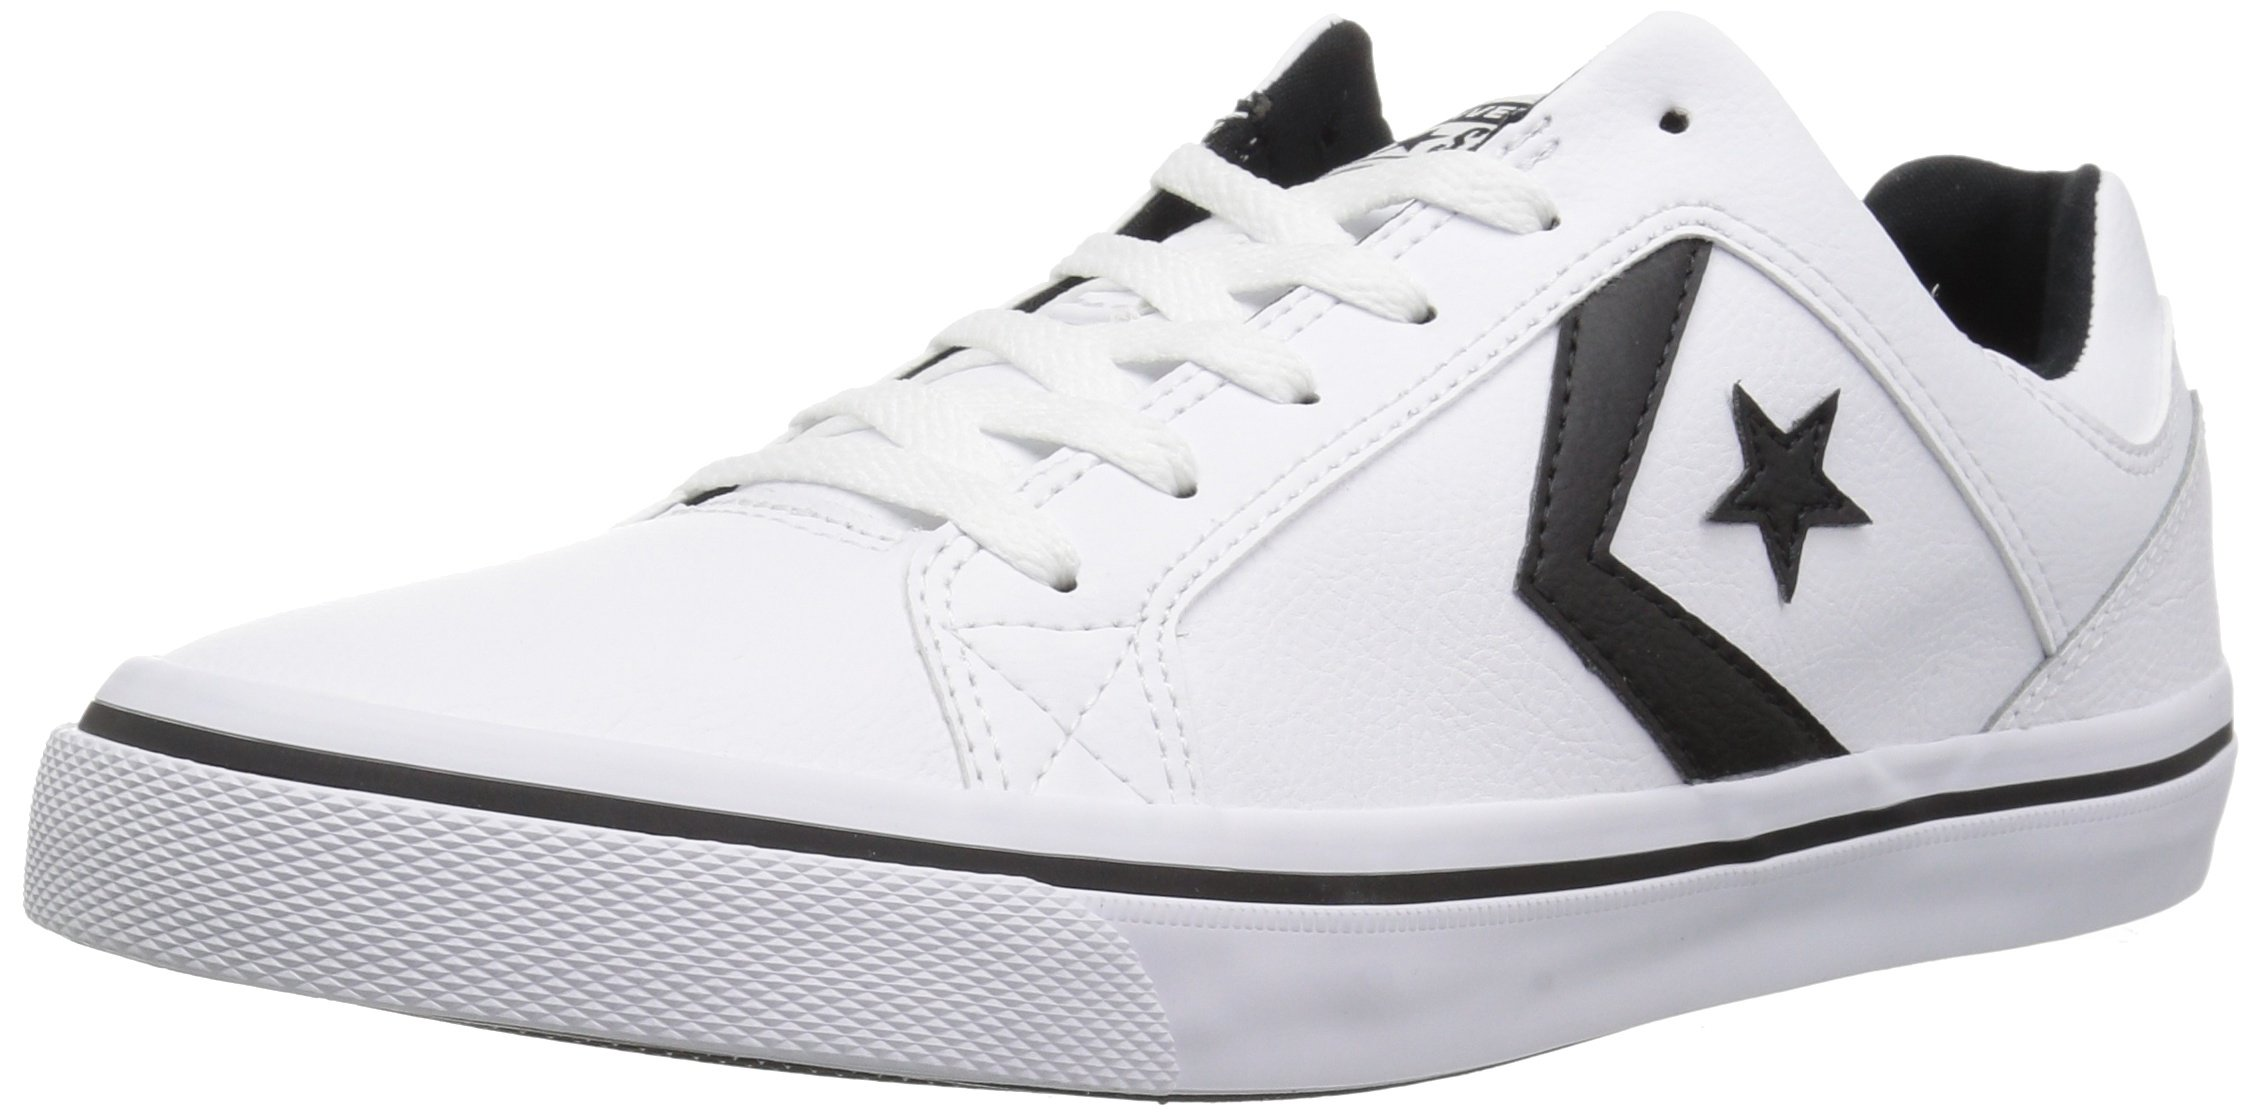 Converse EL Distrito Leather Low Top Sneaker, White/Black/White, 10 M US